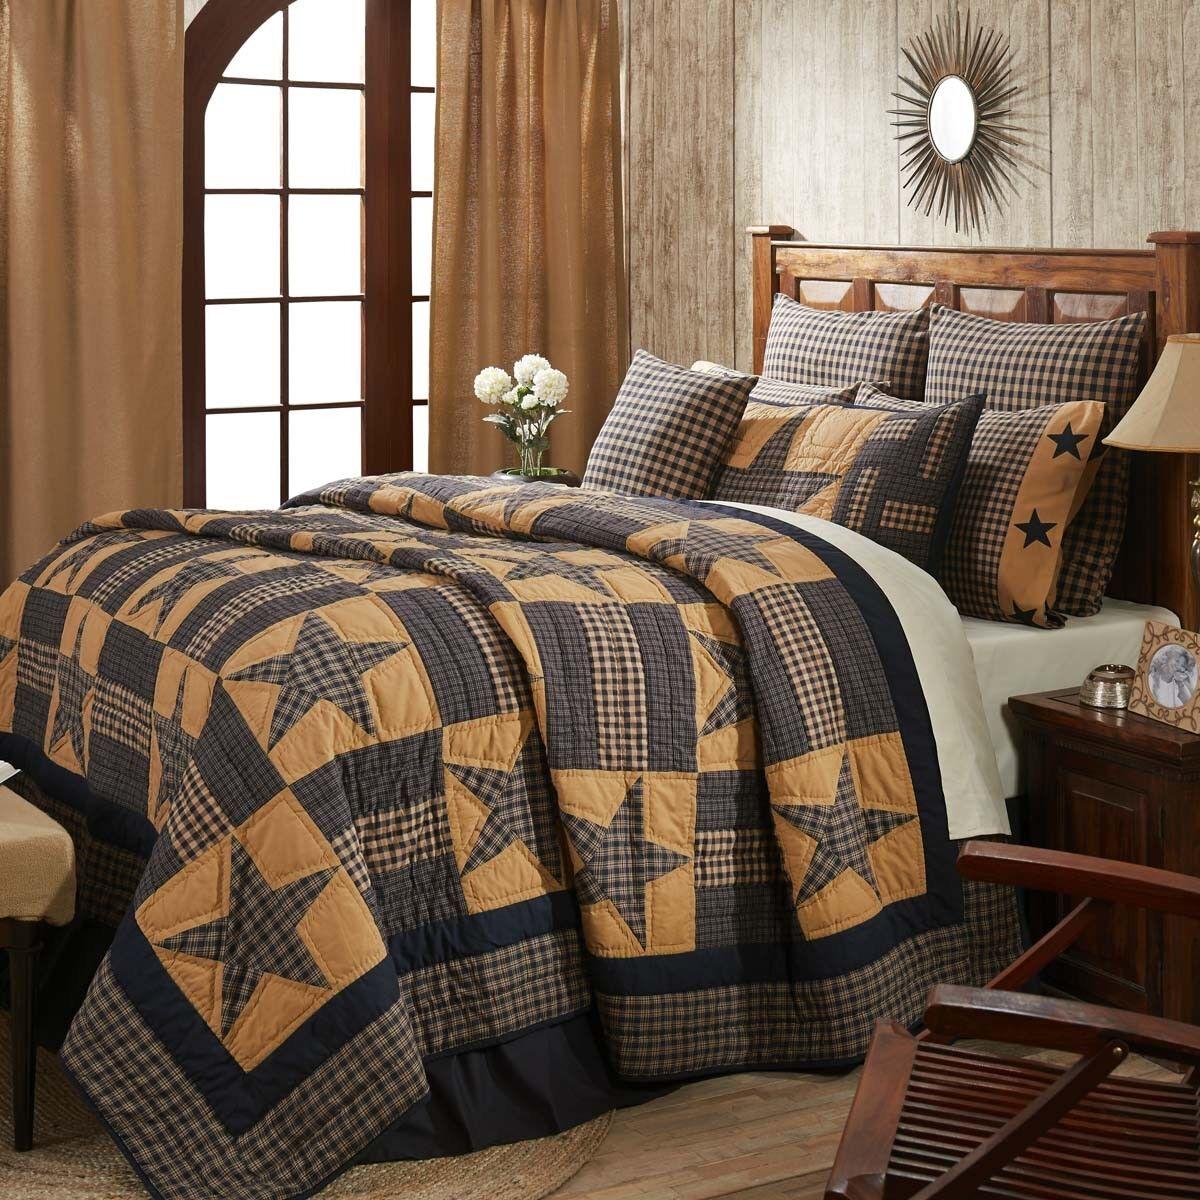 VHC Teton Star Cotton Quilt (Your Choice Size & Accessories) Navy Primitive Star